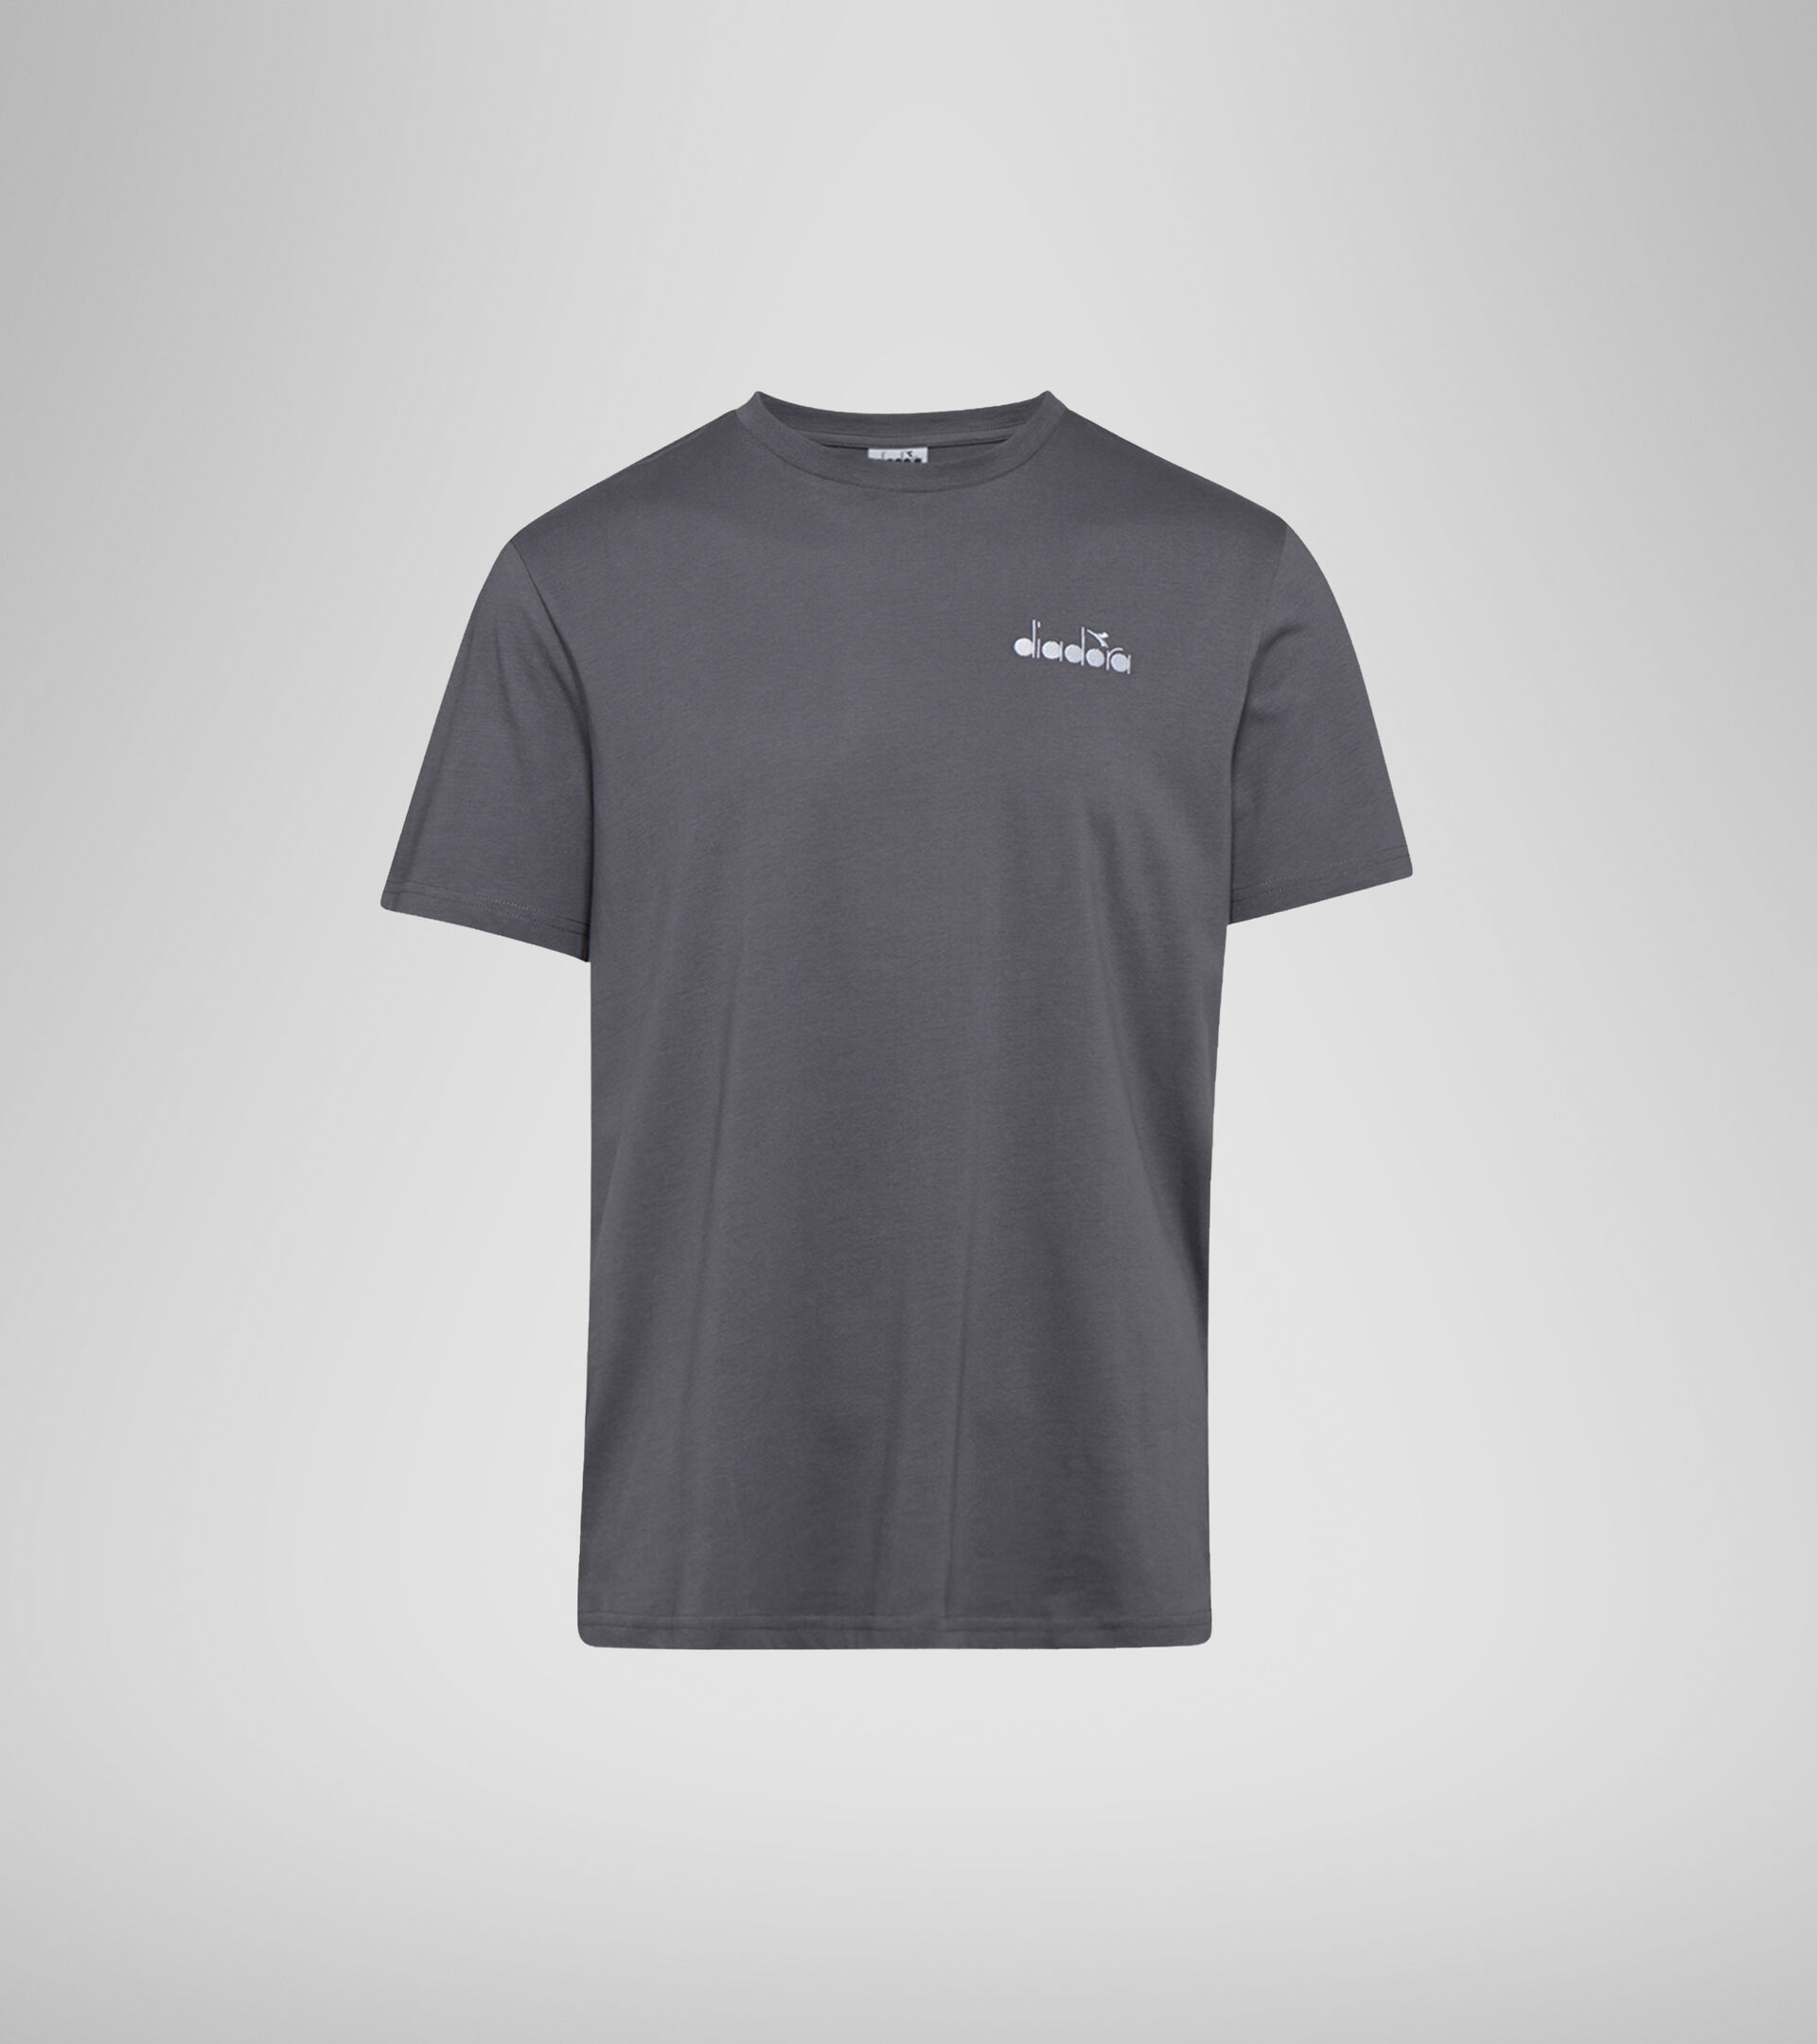 Camiseta - Hombre SS T-SHIRT CORE OC GRIS CARBON - Diadora